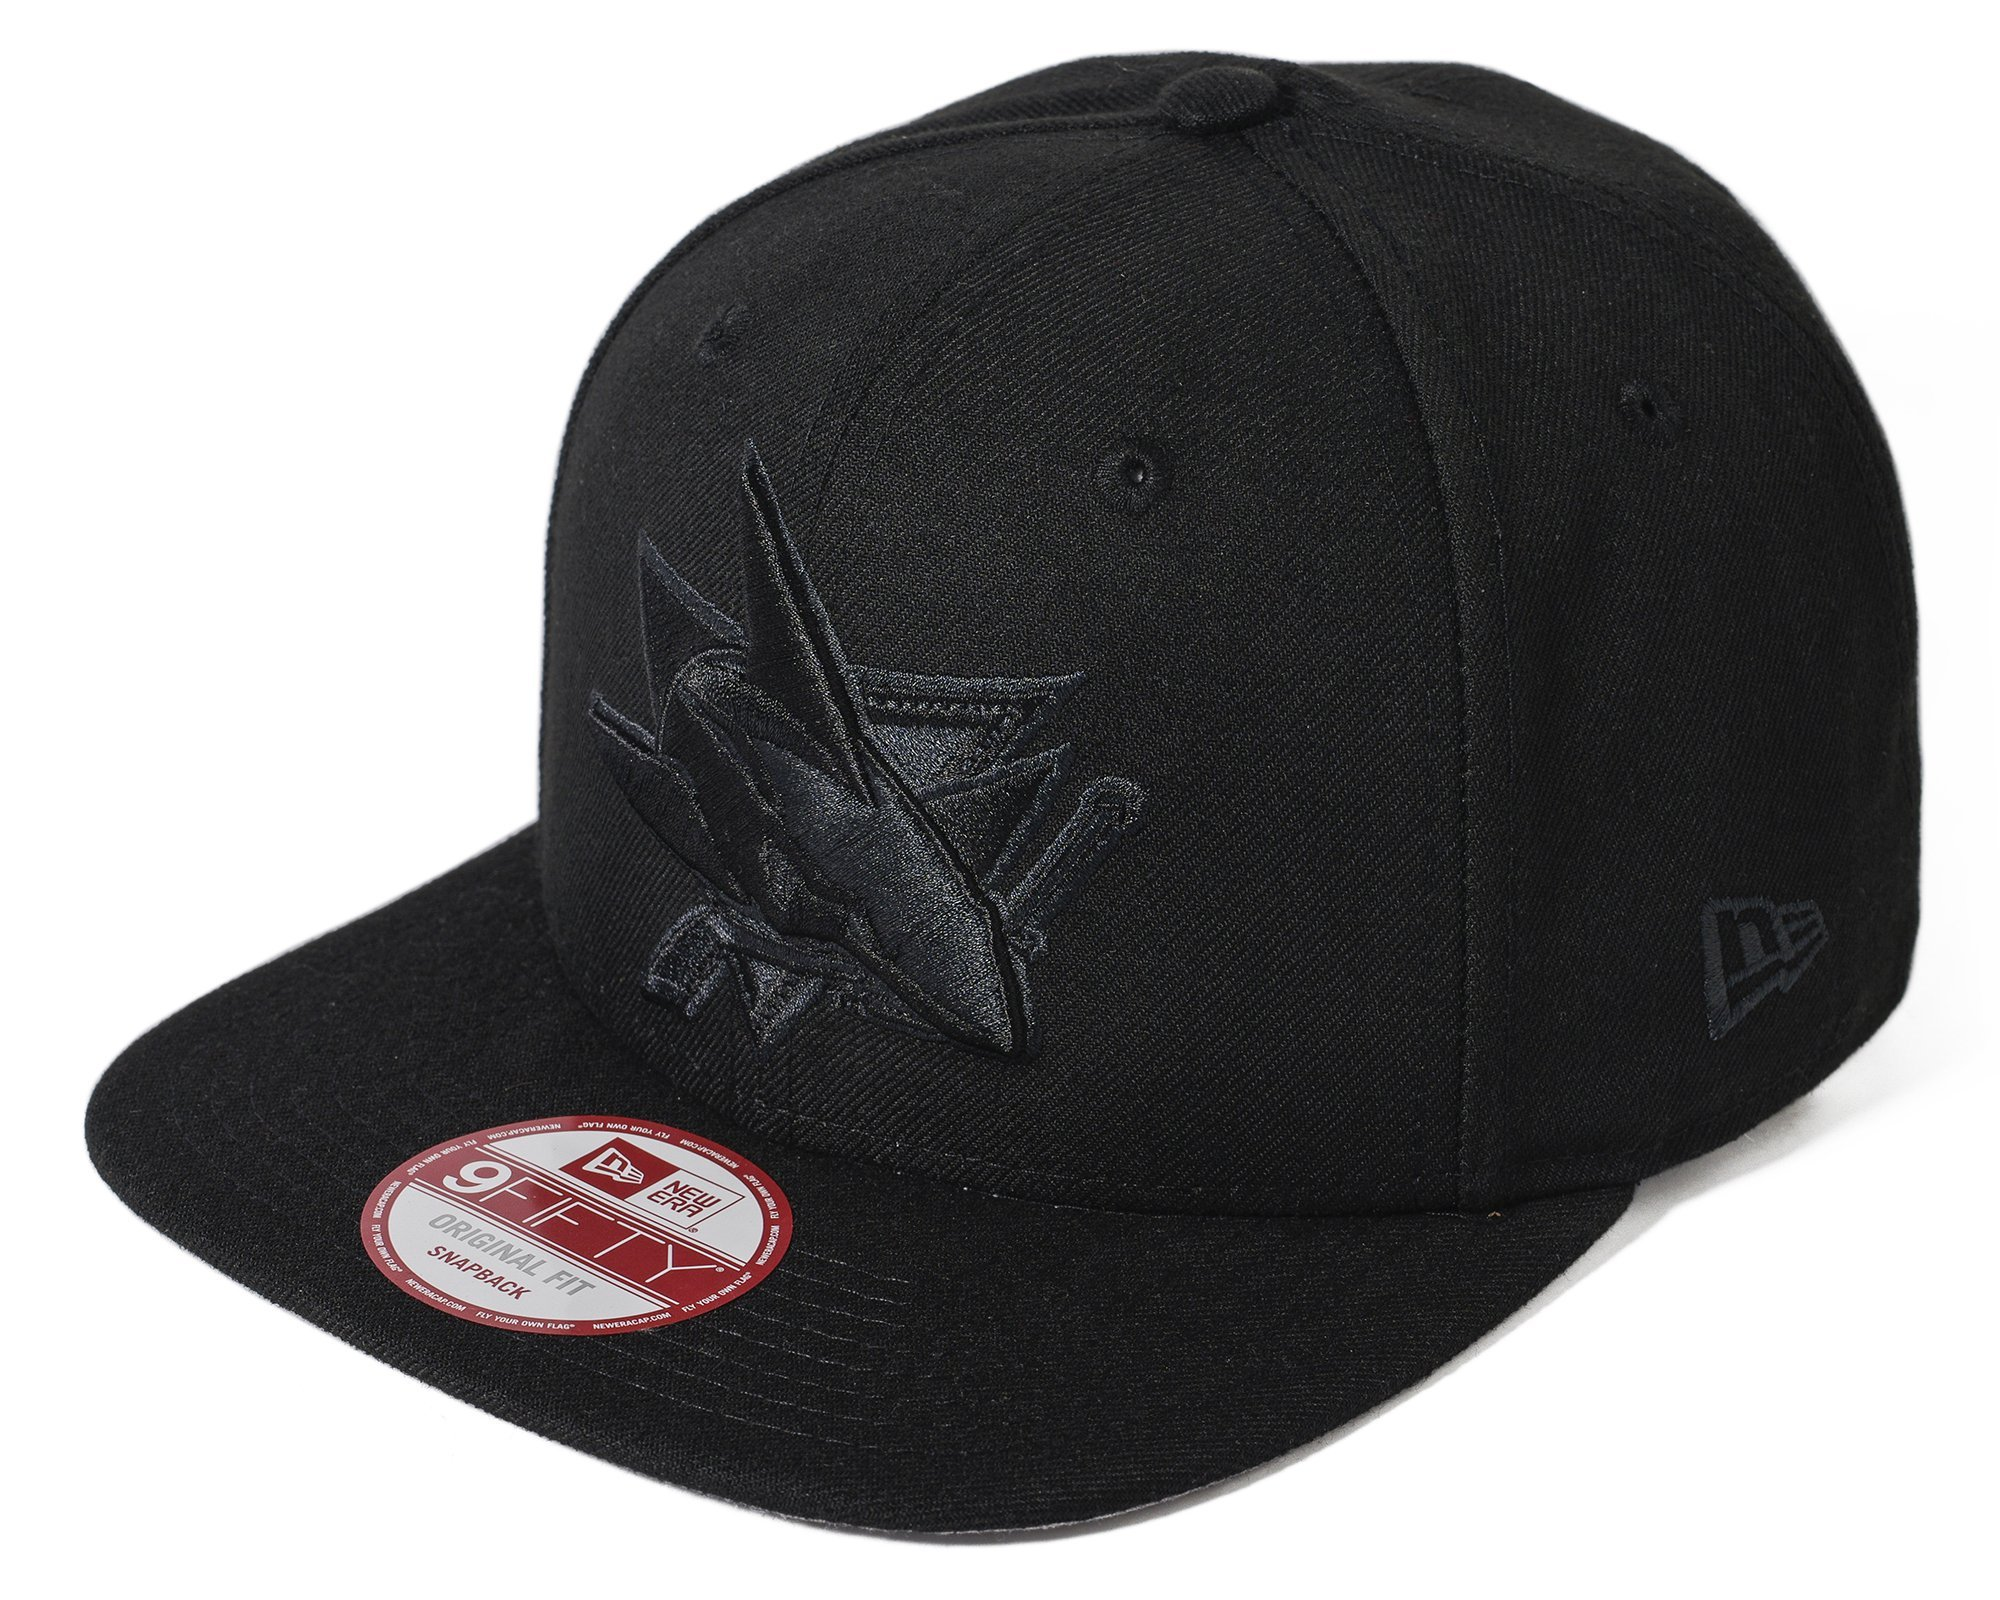 half off 2c2ee c88d6 100% Authentic NWT NHL San Jose Sharks New Era Black Snap Back 9Fifty  Original Fit